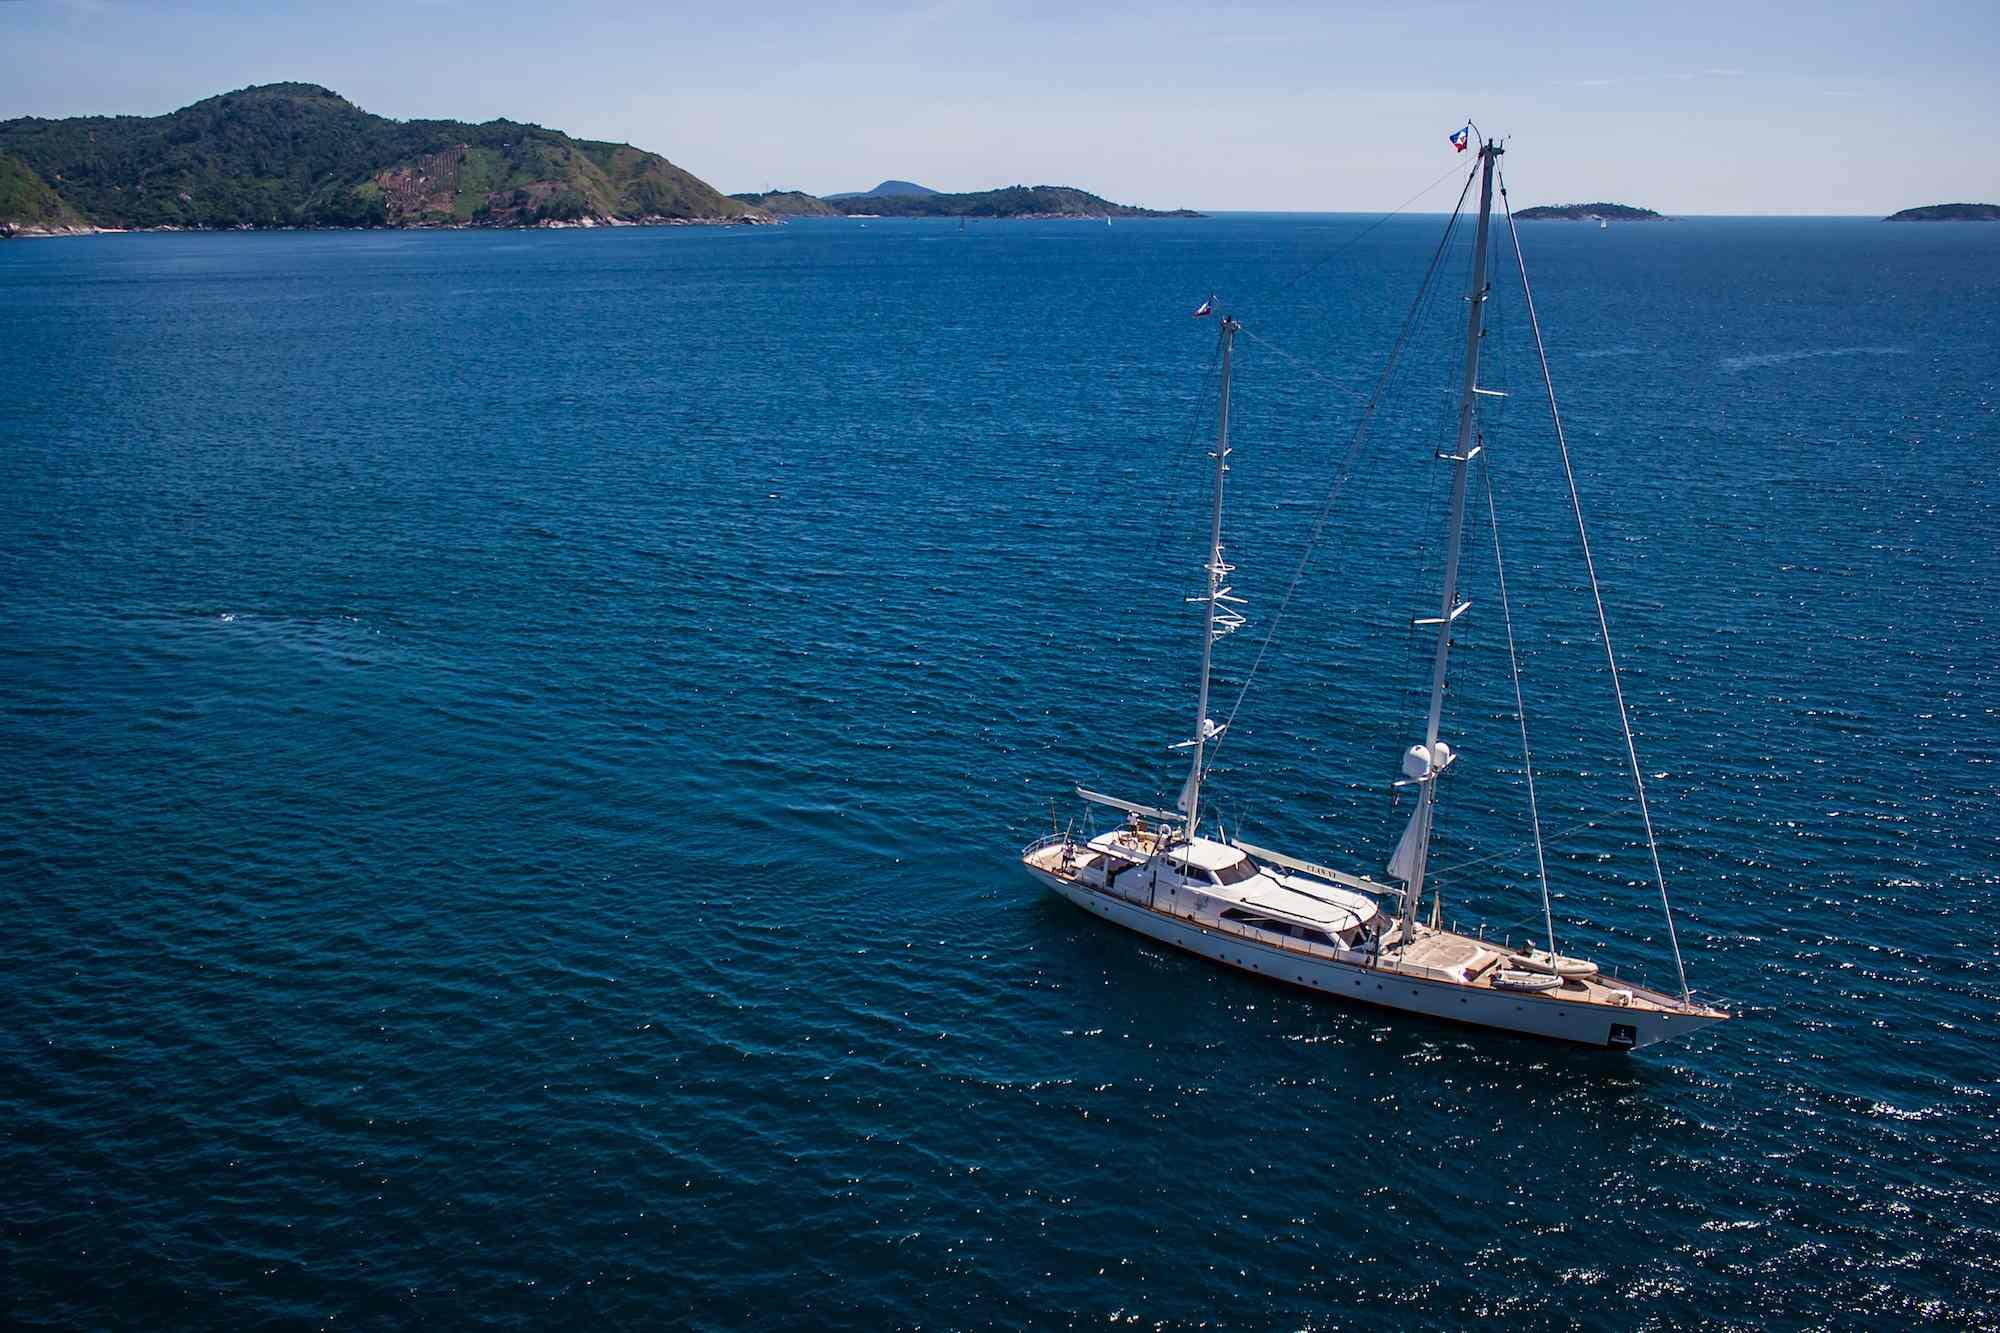 Clan VI_sailing on rippled waters in Mergui Island_XS.jpeg